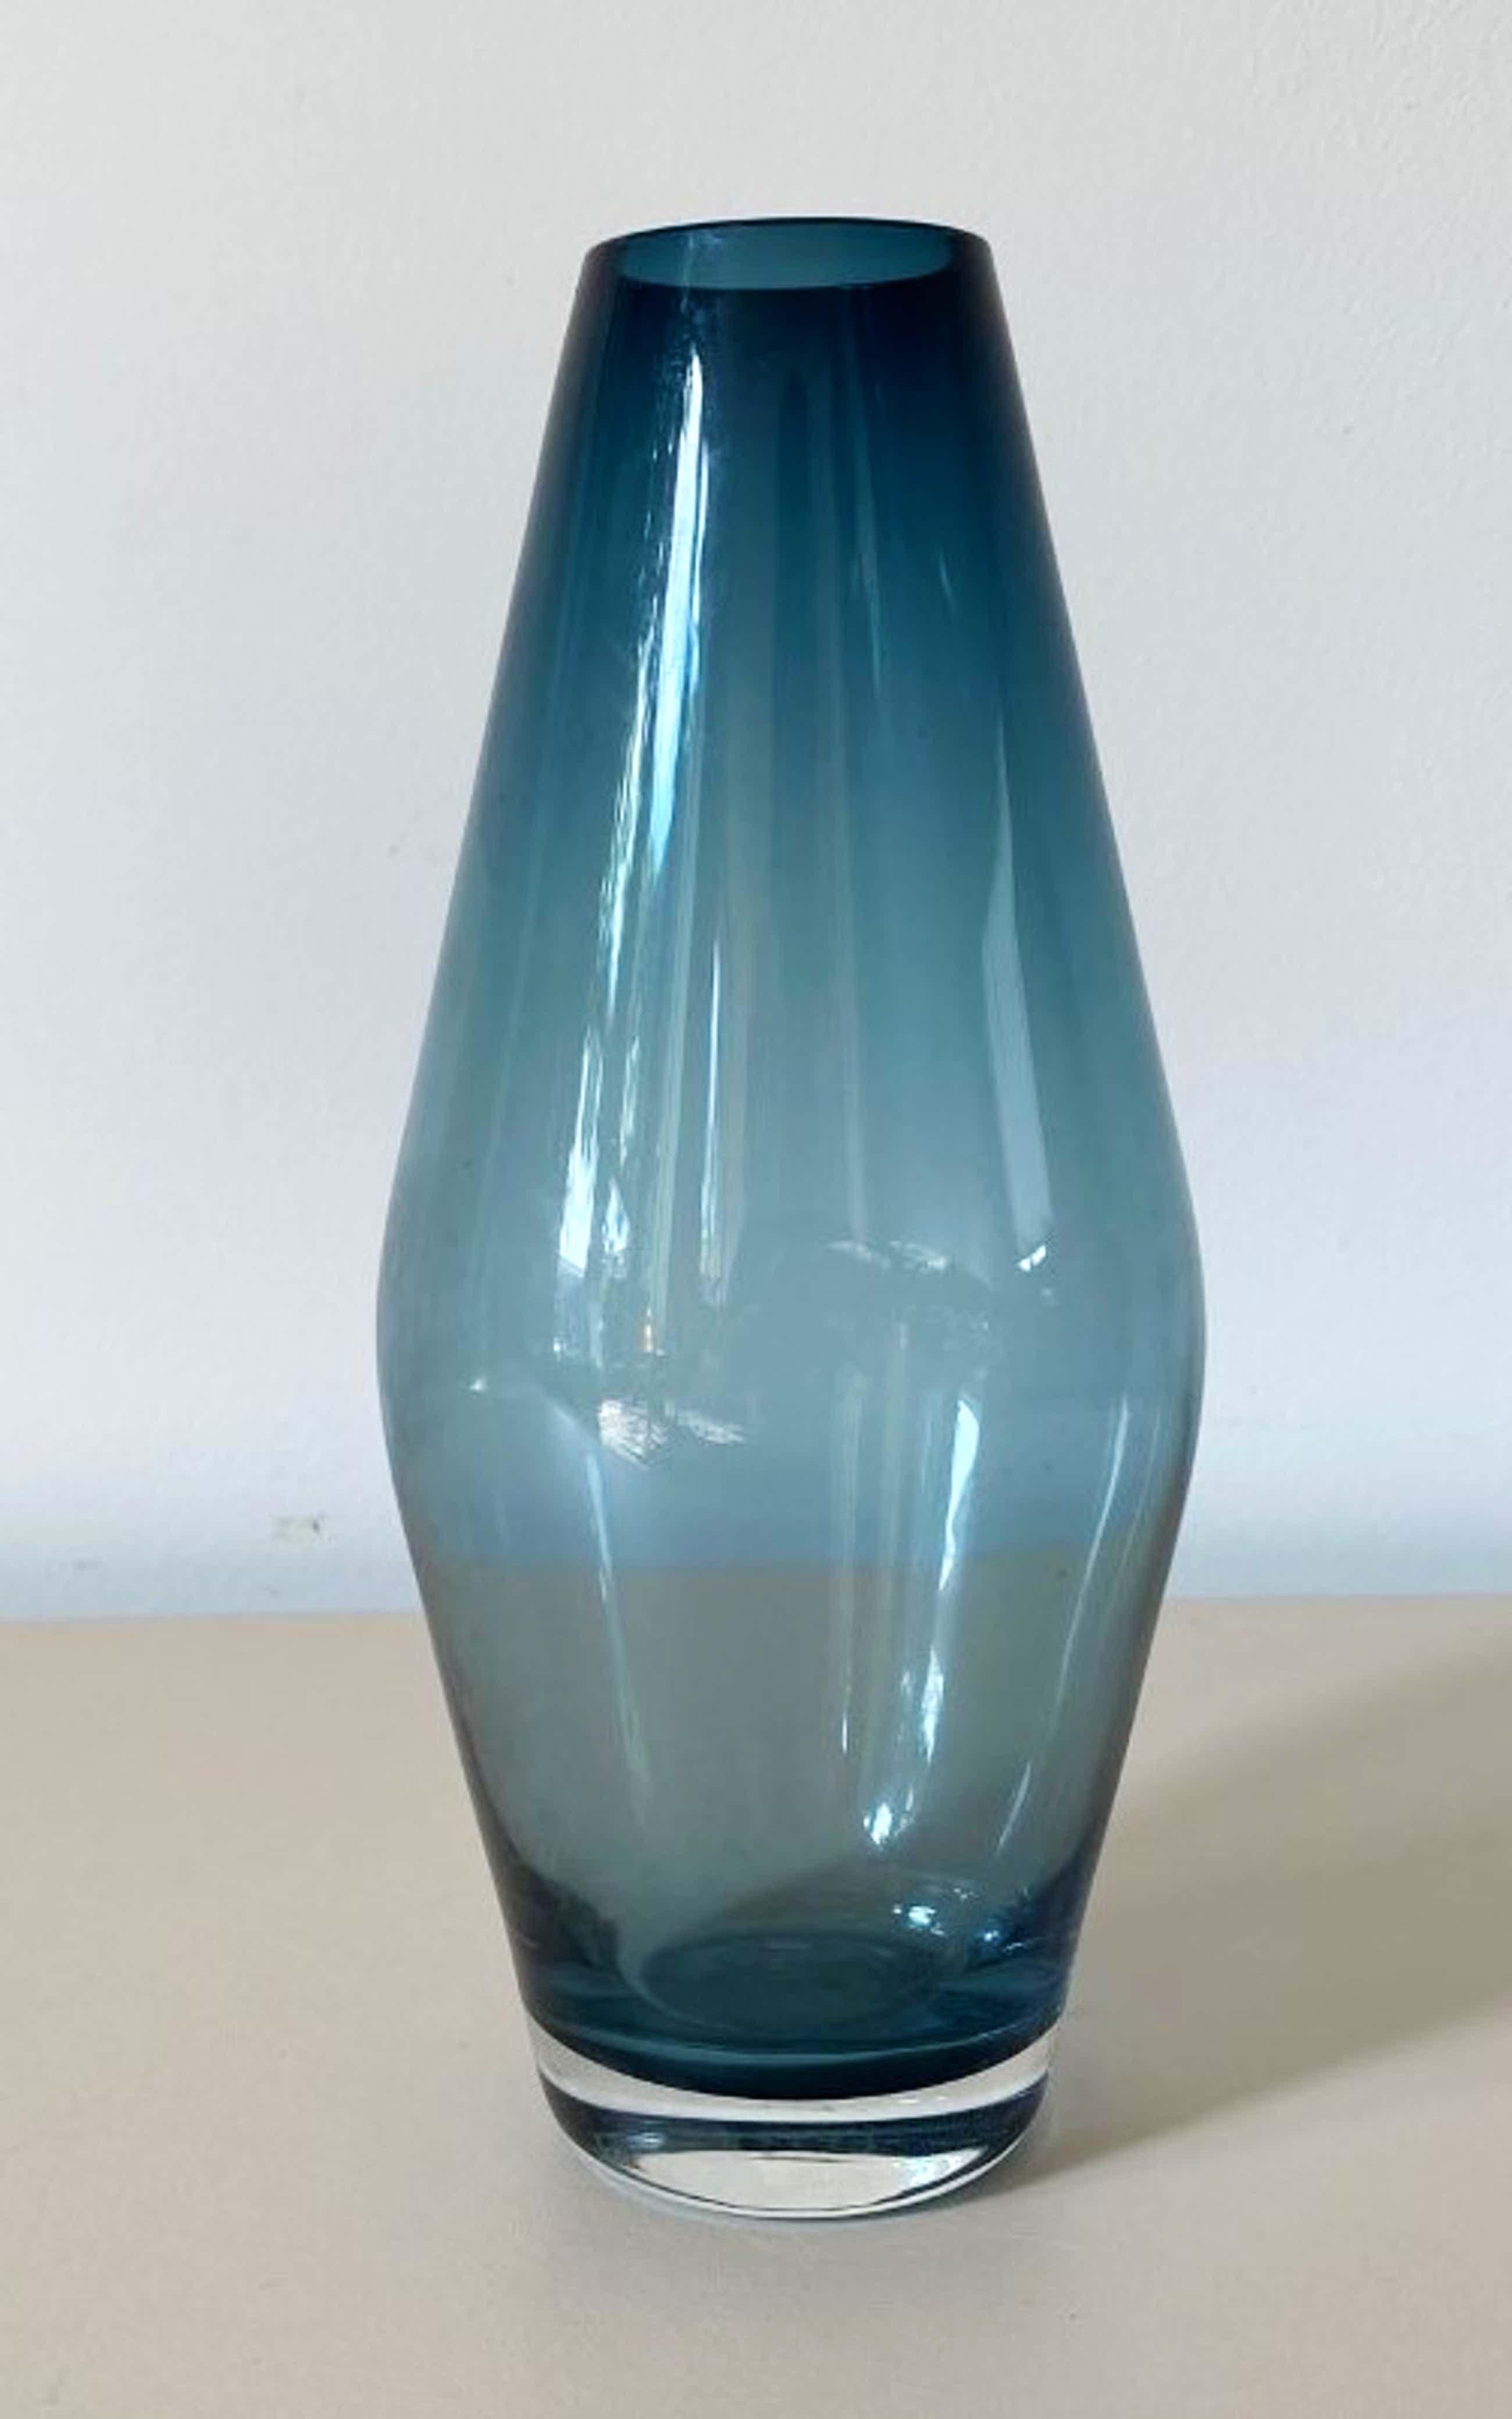 Tamara Aladin - Saffierblauwe glazenvaas - Riihimaki kopen? Bied vanaf 5!